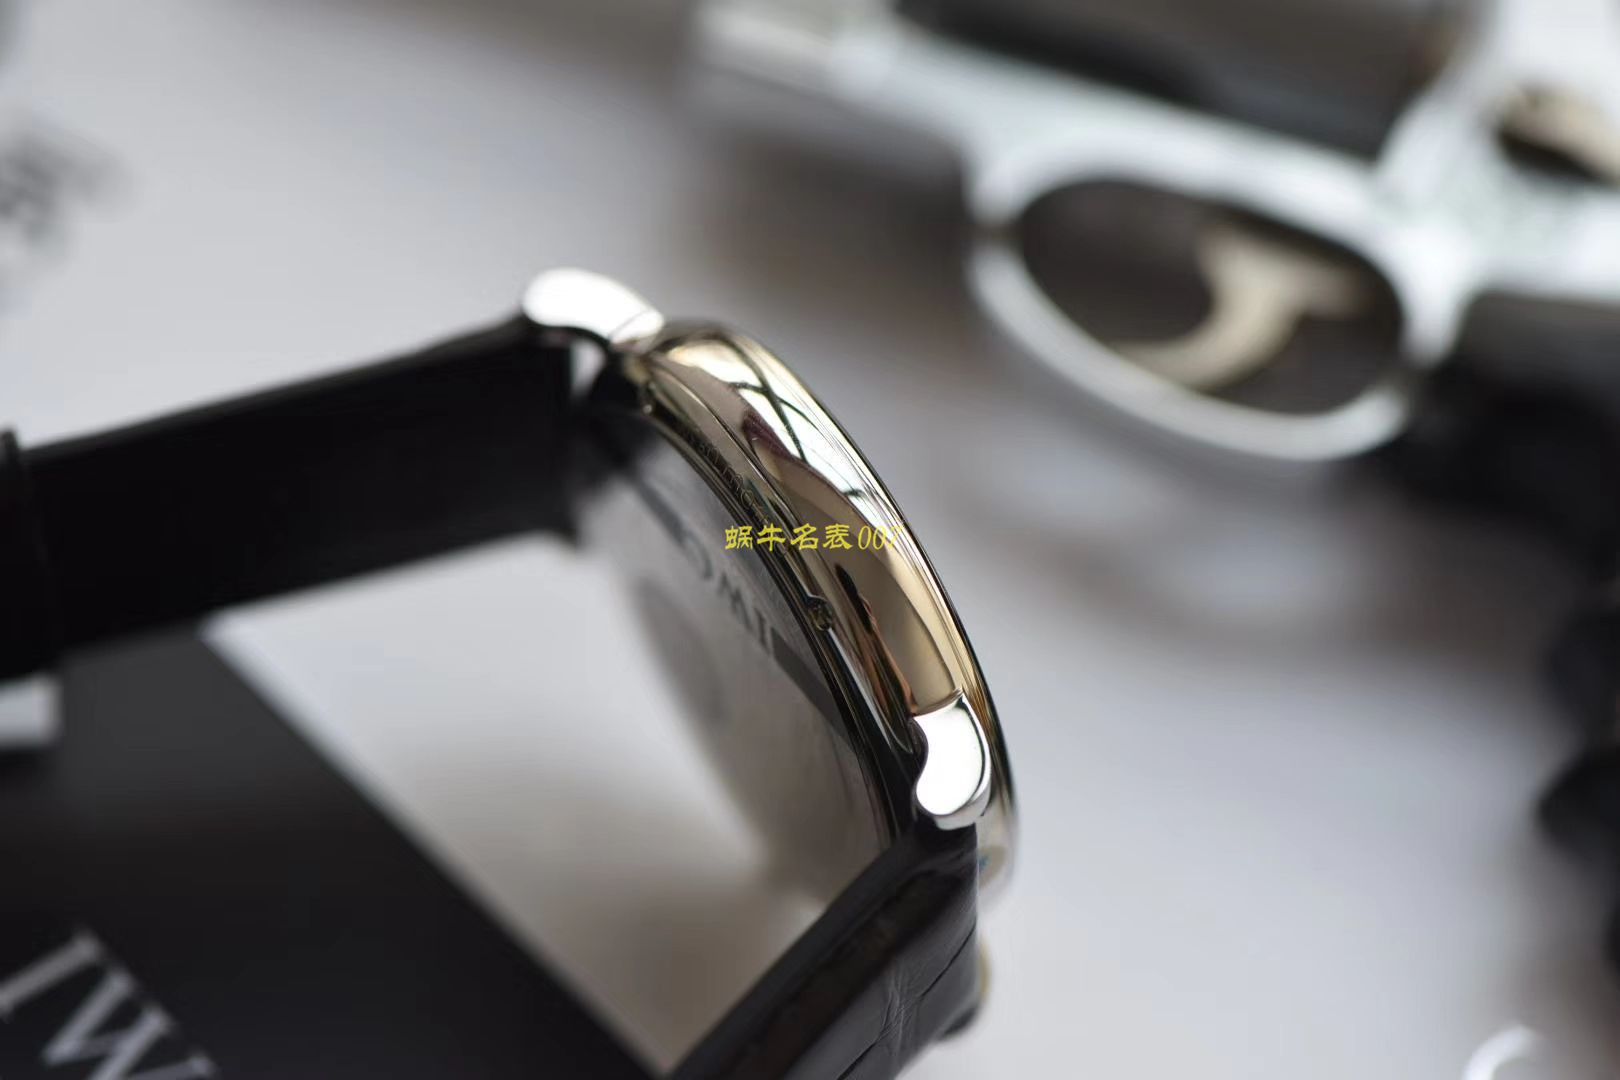 V7超A高仿IWC万国柏涛菲诺IW356523腕表专柜最新款波涛菲诺蓝面金针 / WG512